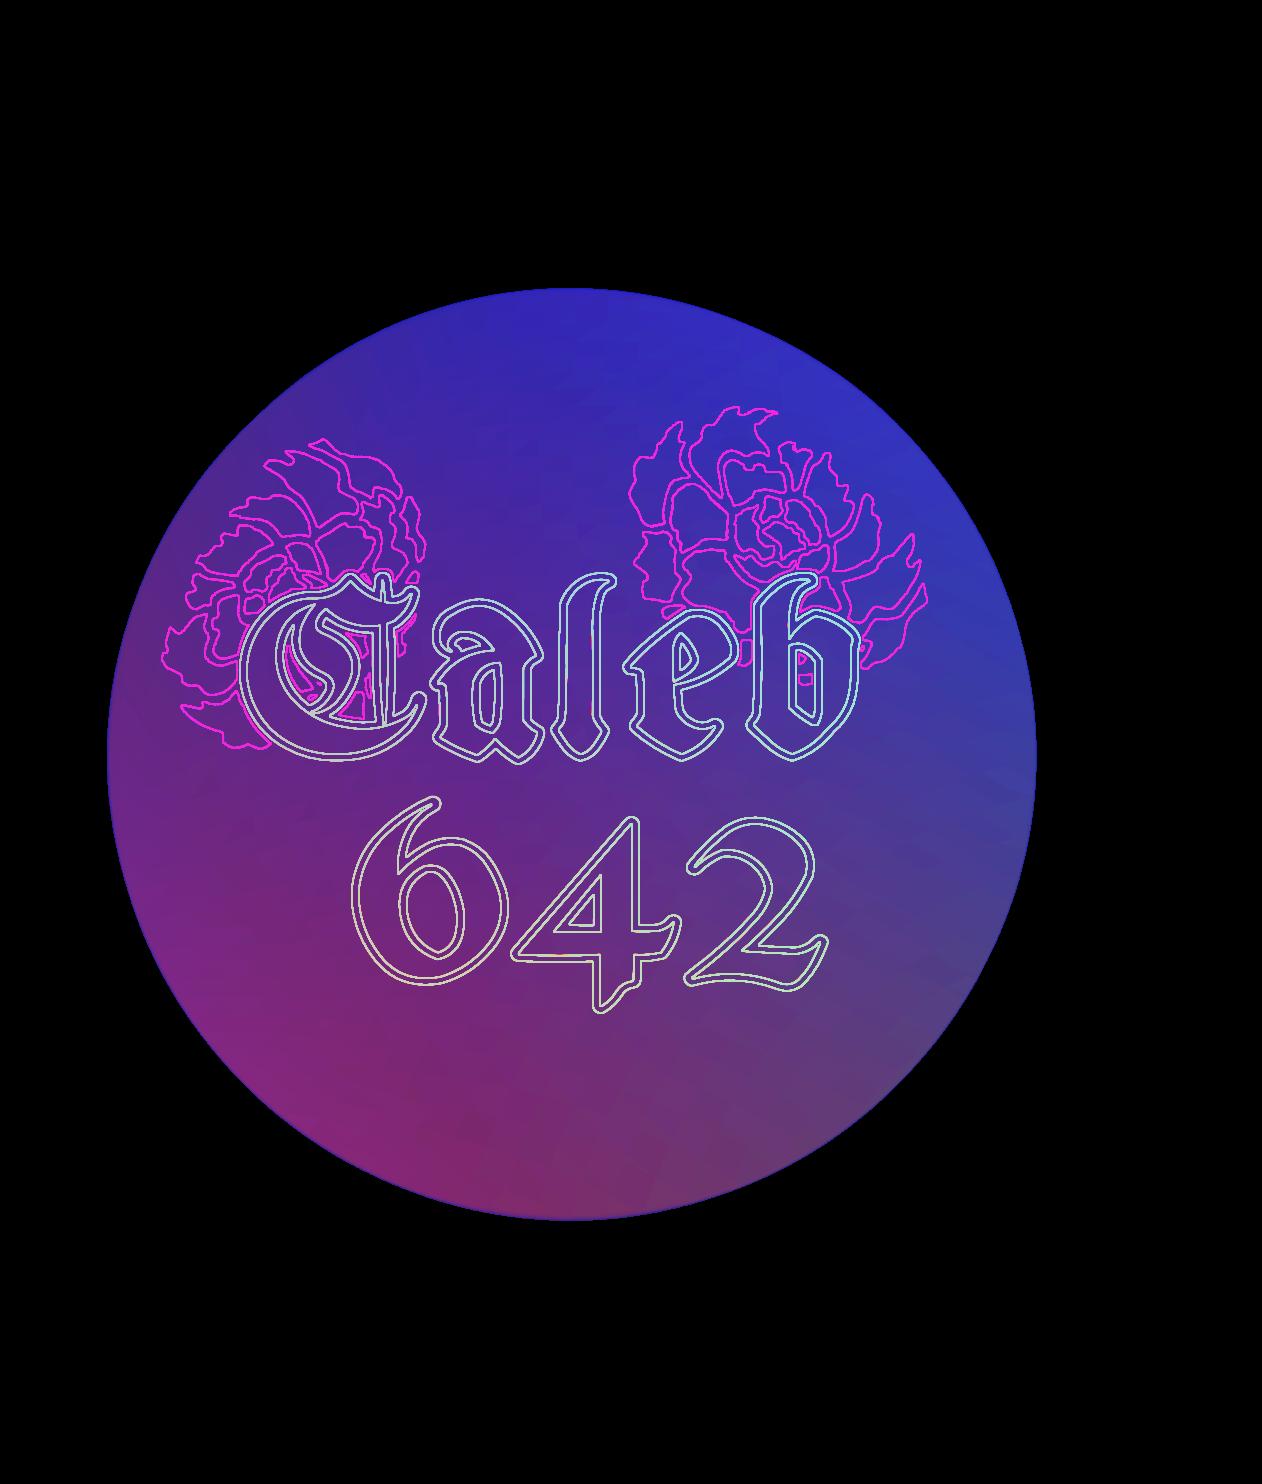 Caleb642